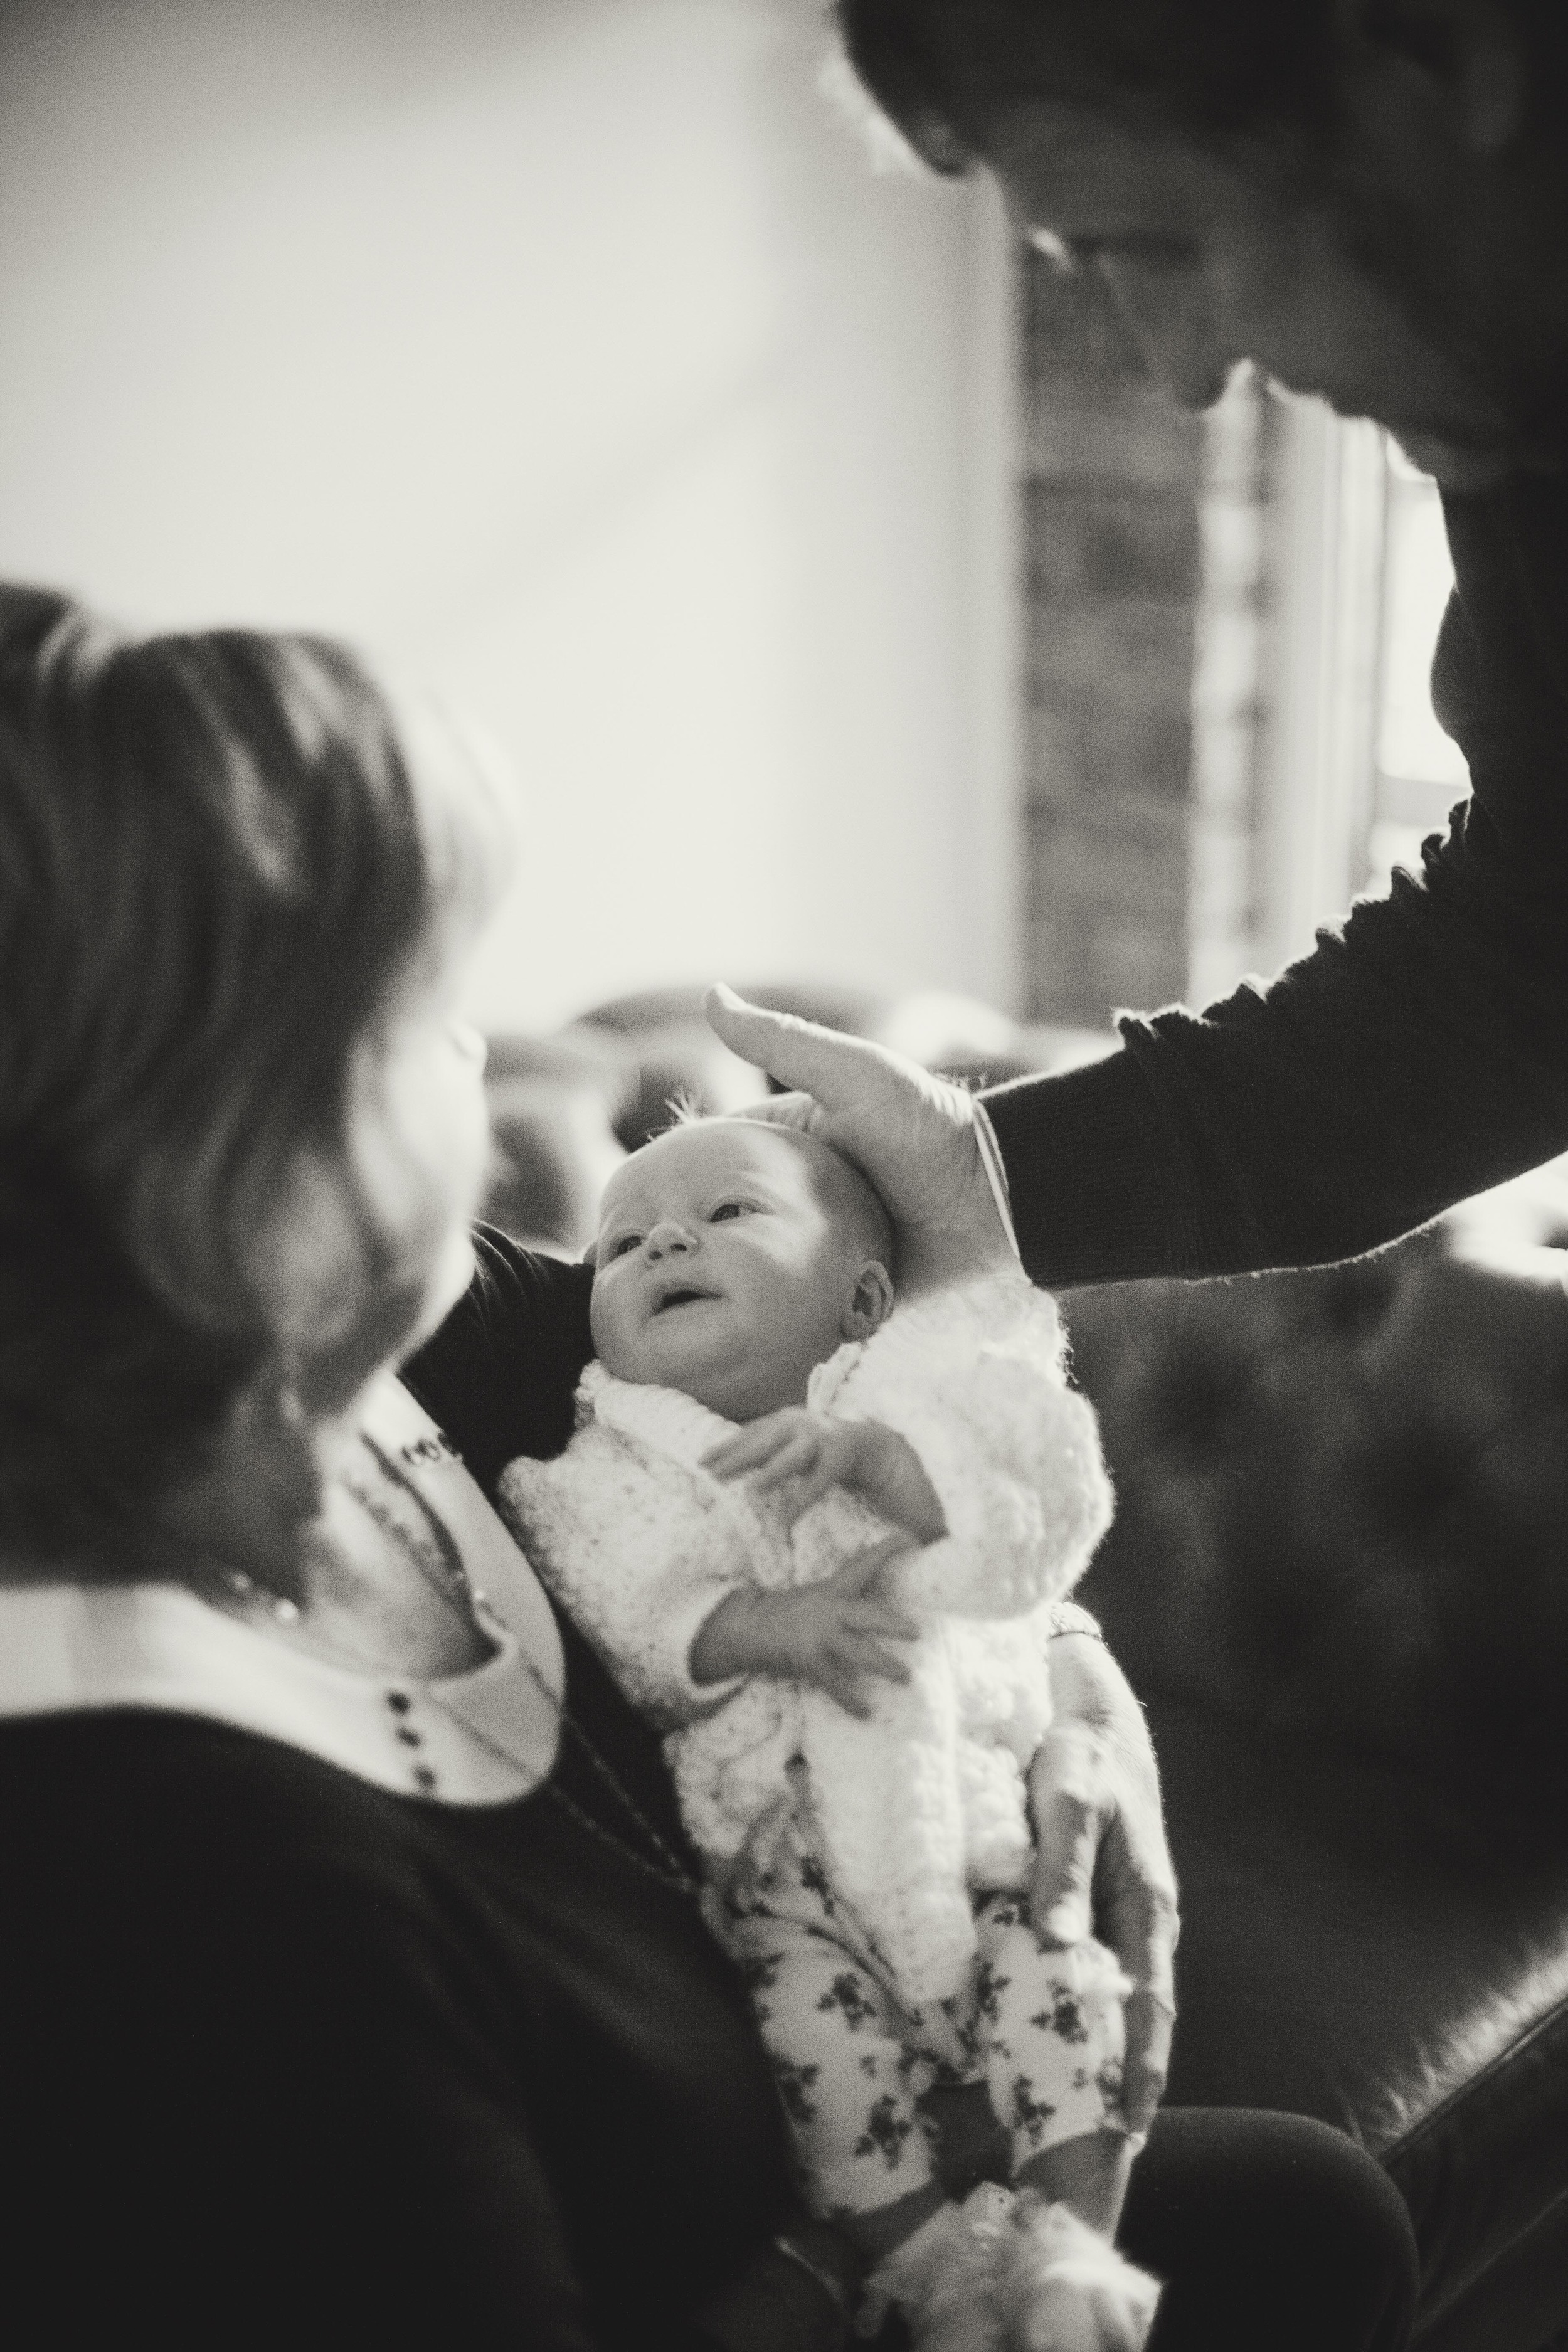 grandparents holding newborn